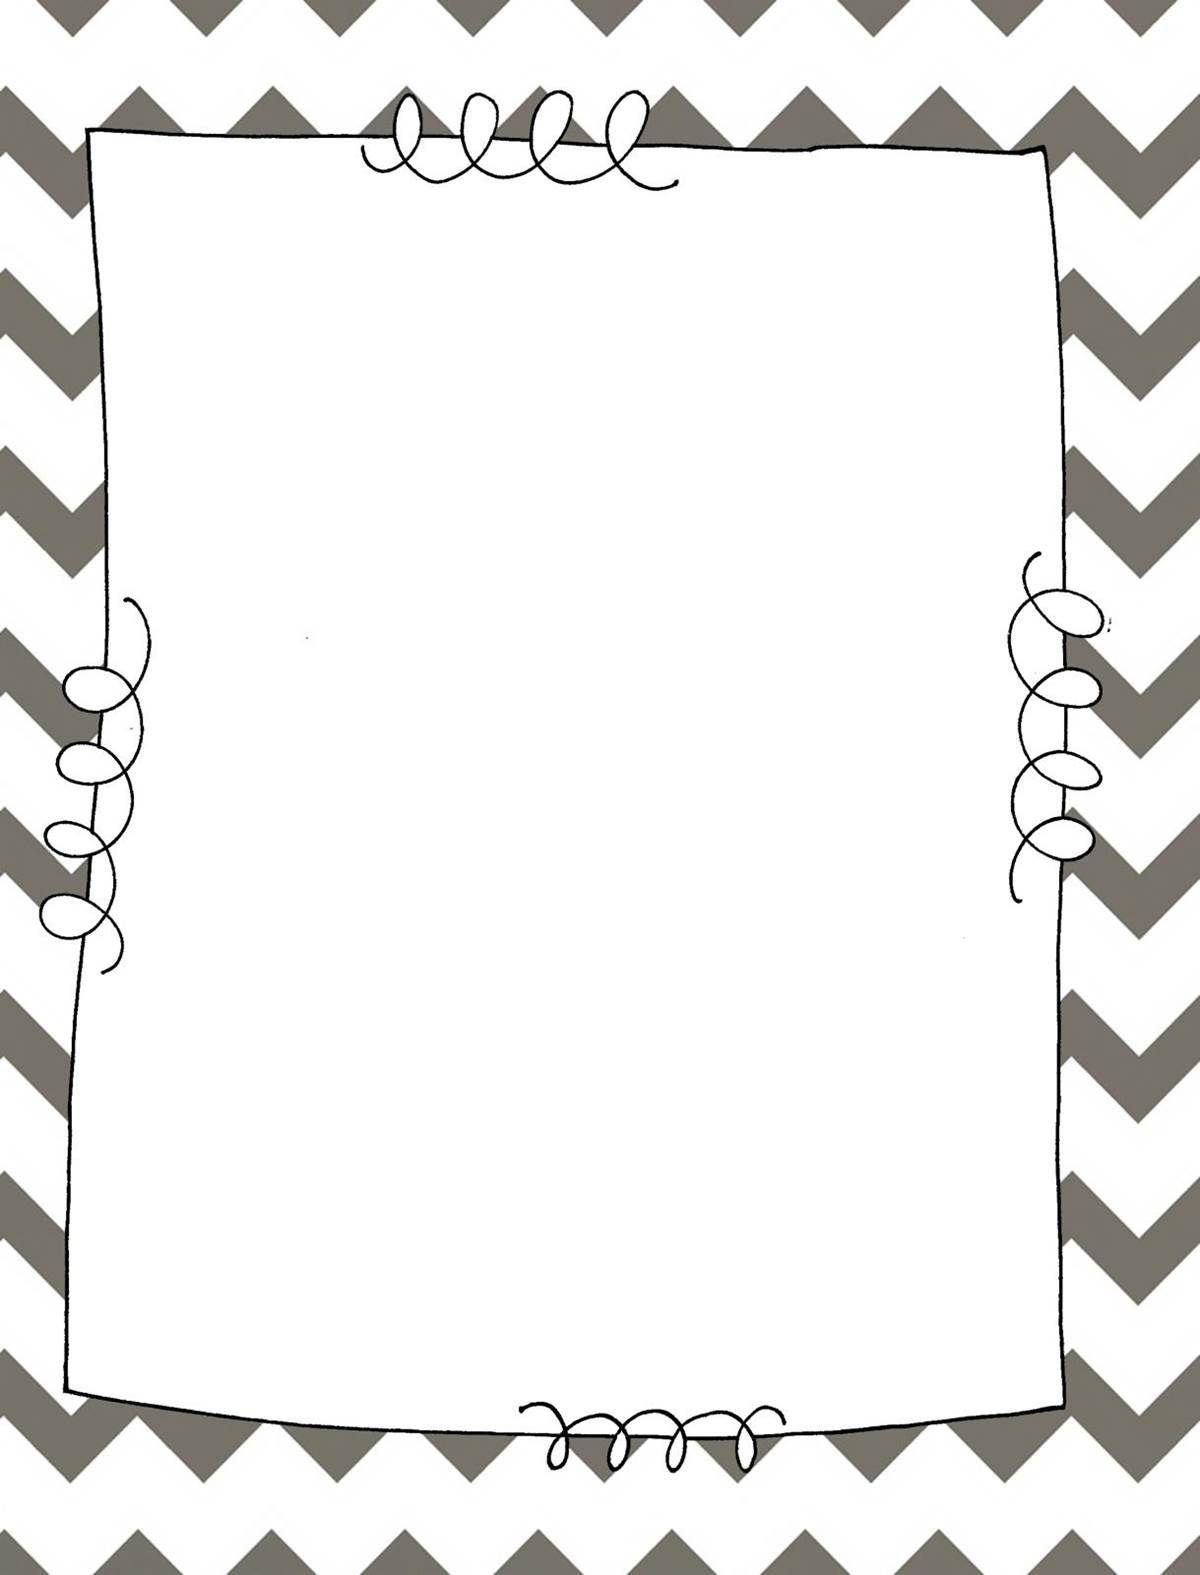 Microsoft Word Microsoft Office Clip Art Borders Formal Page Borders Apple Border Clip Art Clip Art Borders Free Word Art Clip Art Frames Borders